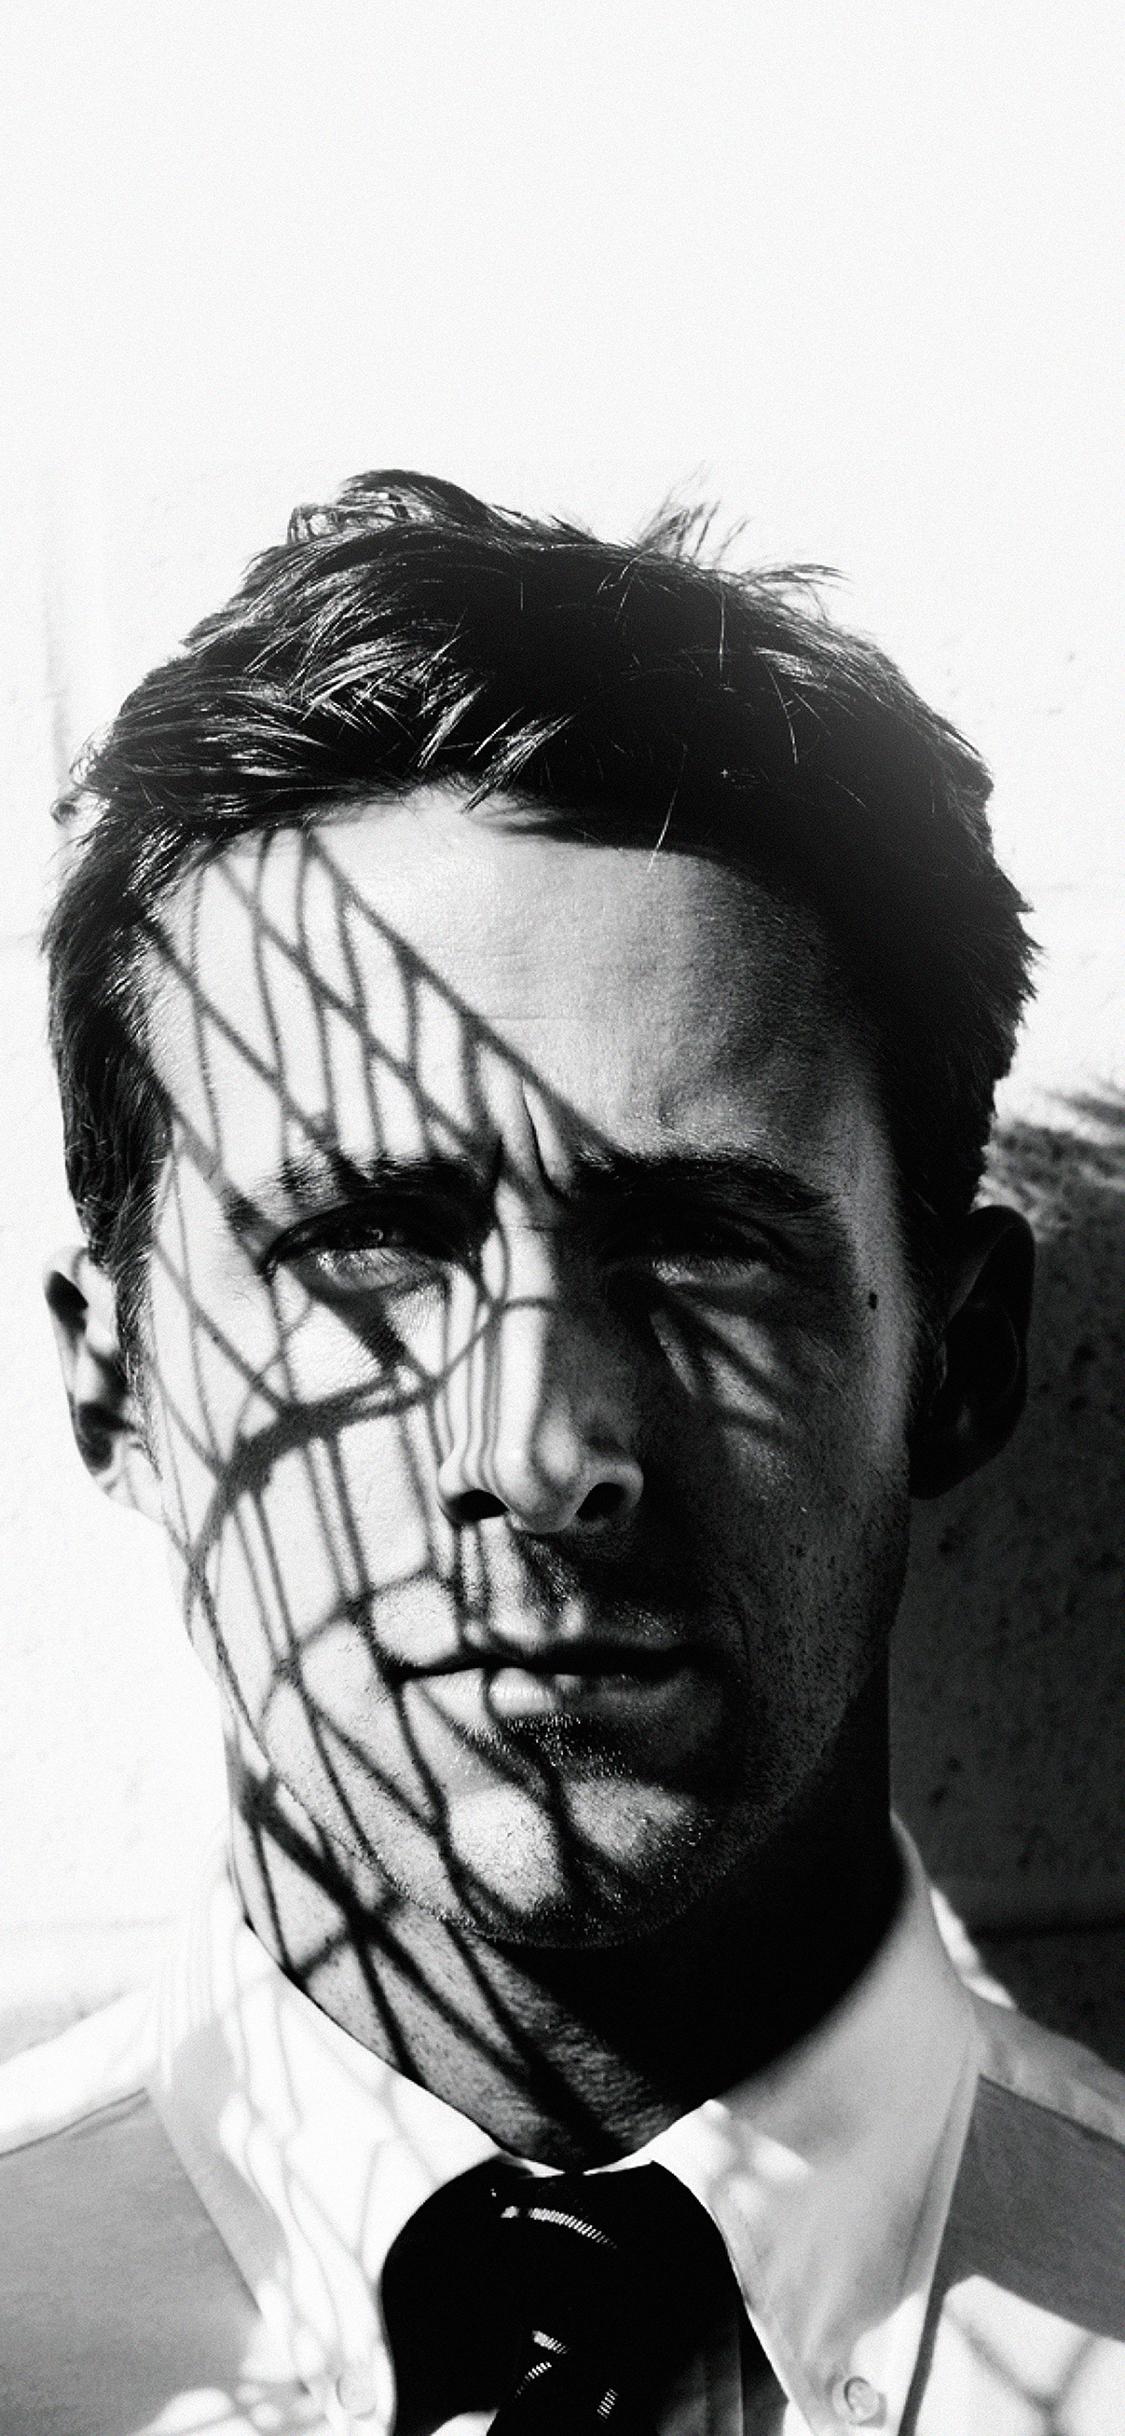 iPhoneXpapers.com-Apple-iPhone-wallpaper-ha81-wallpaper-ryan-gosling-actor-face